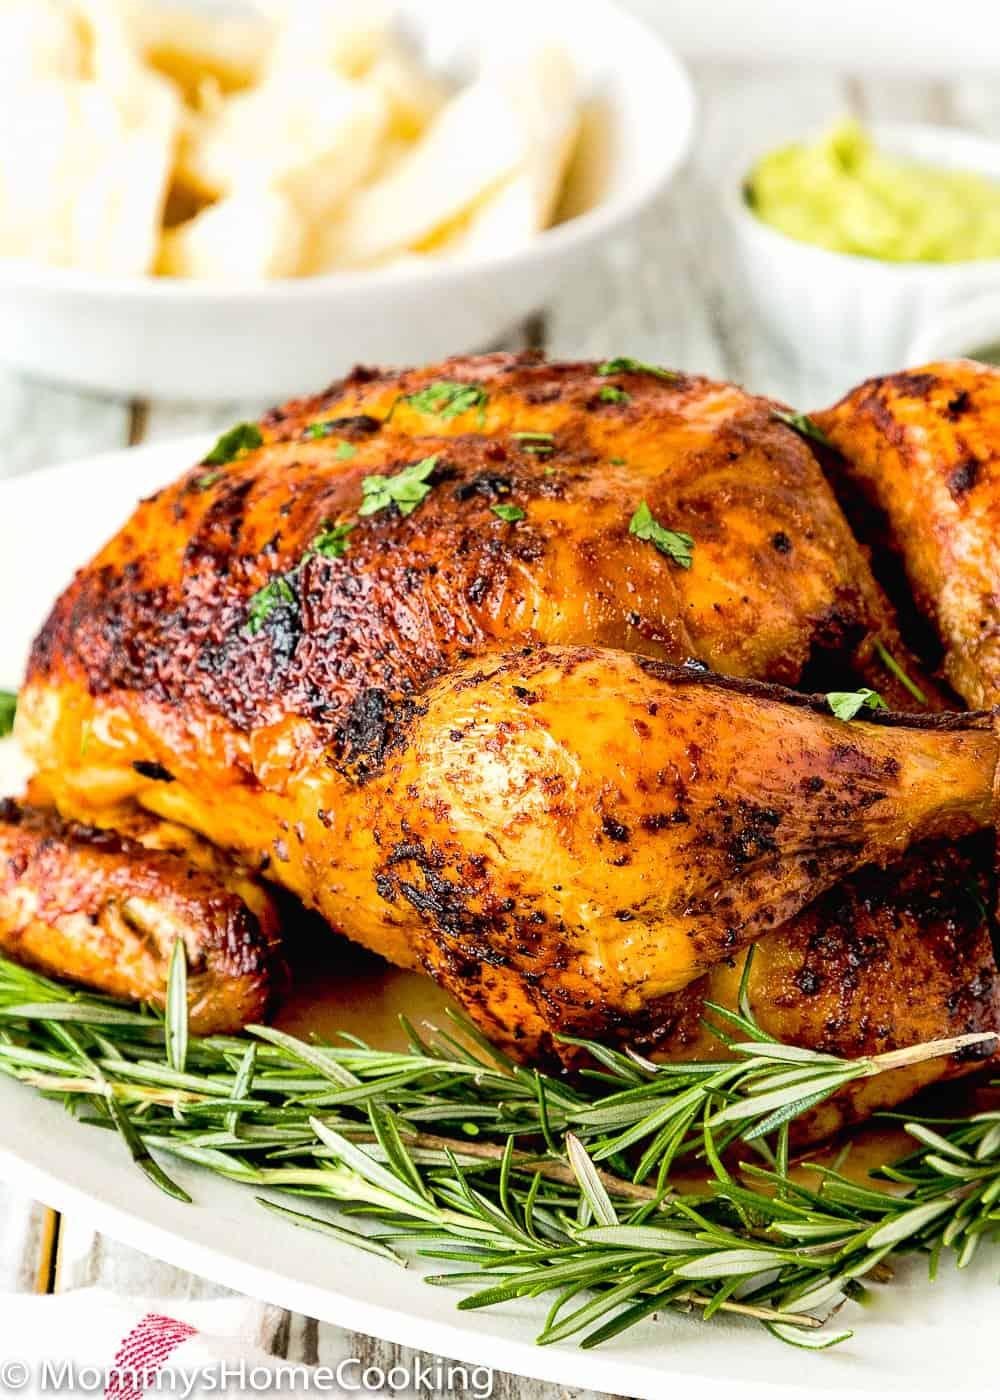 Easy Venezuelan Roasted Chicken with mojo